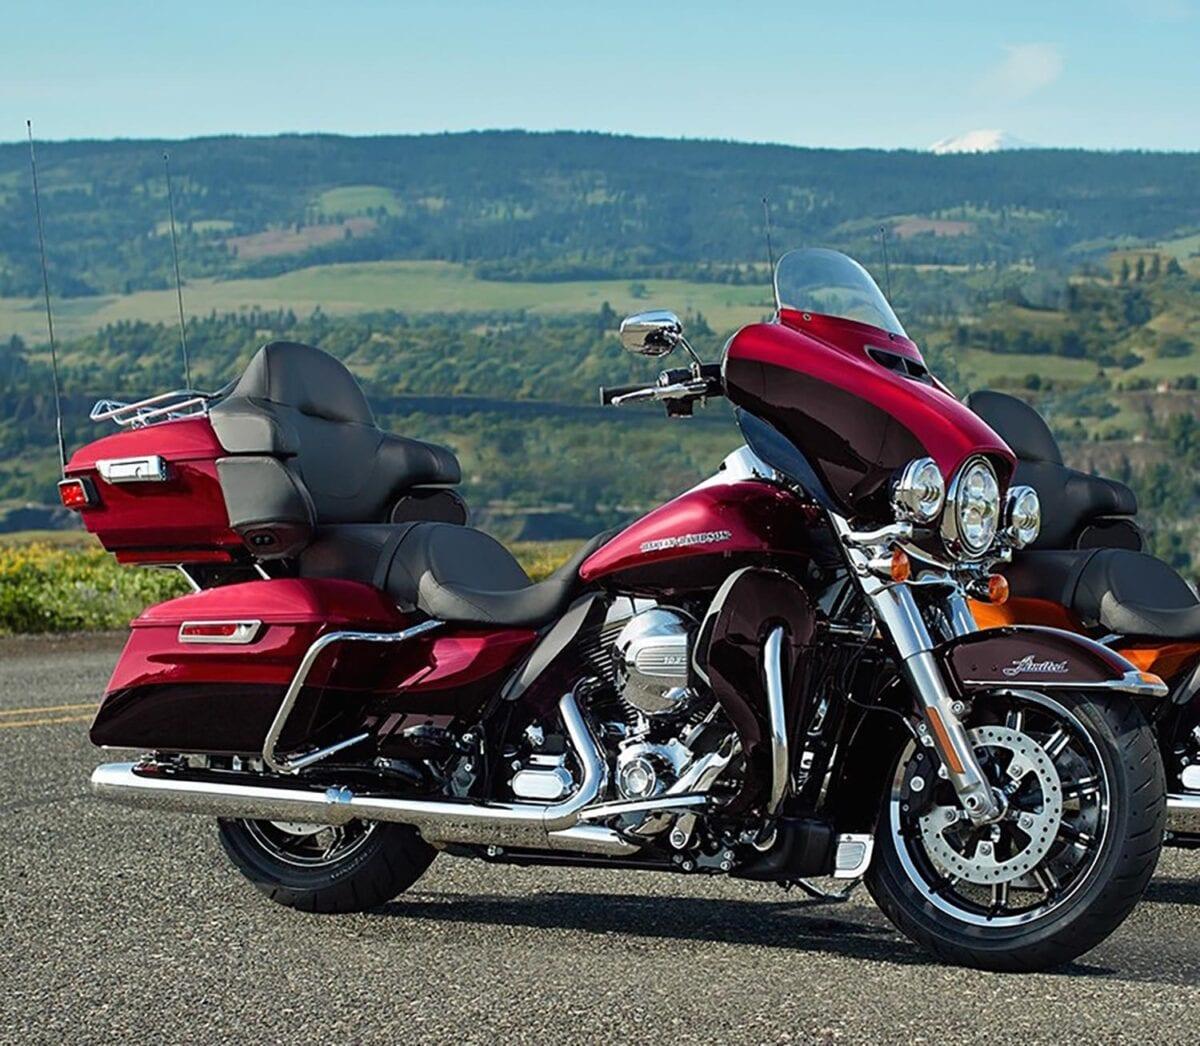 Harley_Davidson_Ultra_Limited